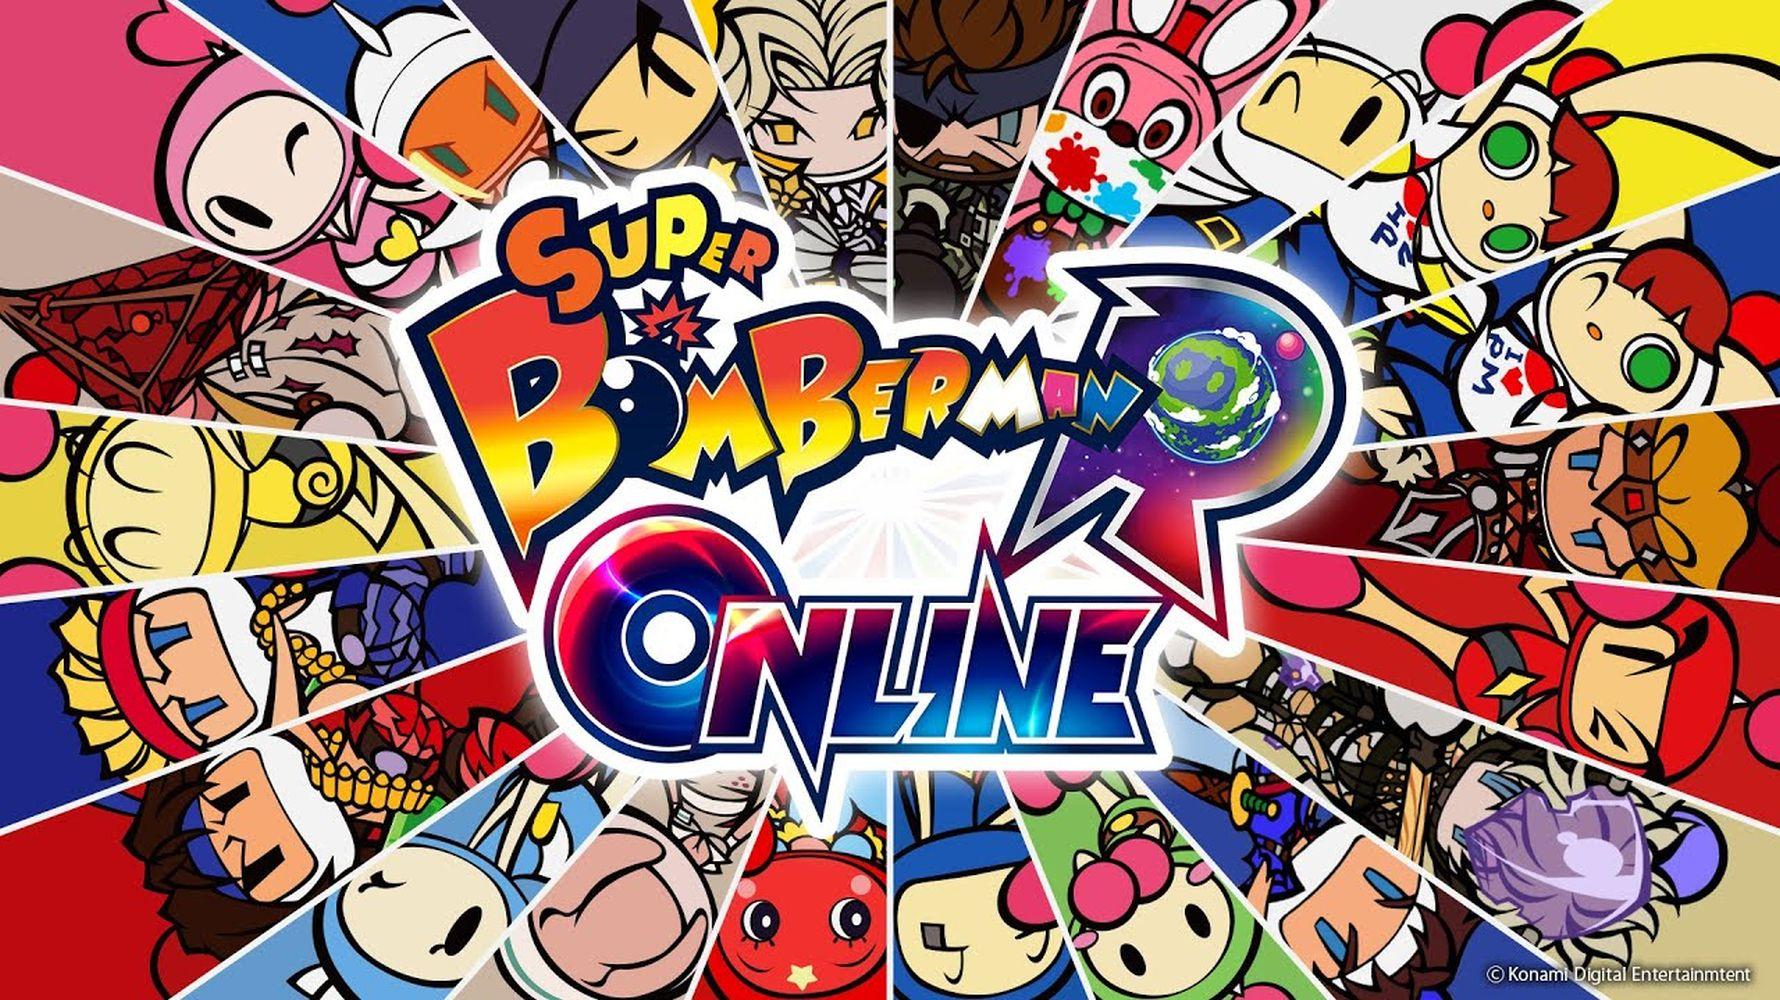 super bomberman r released online